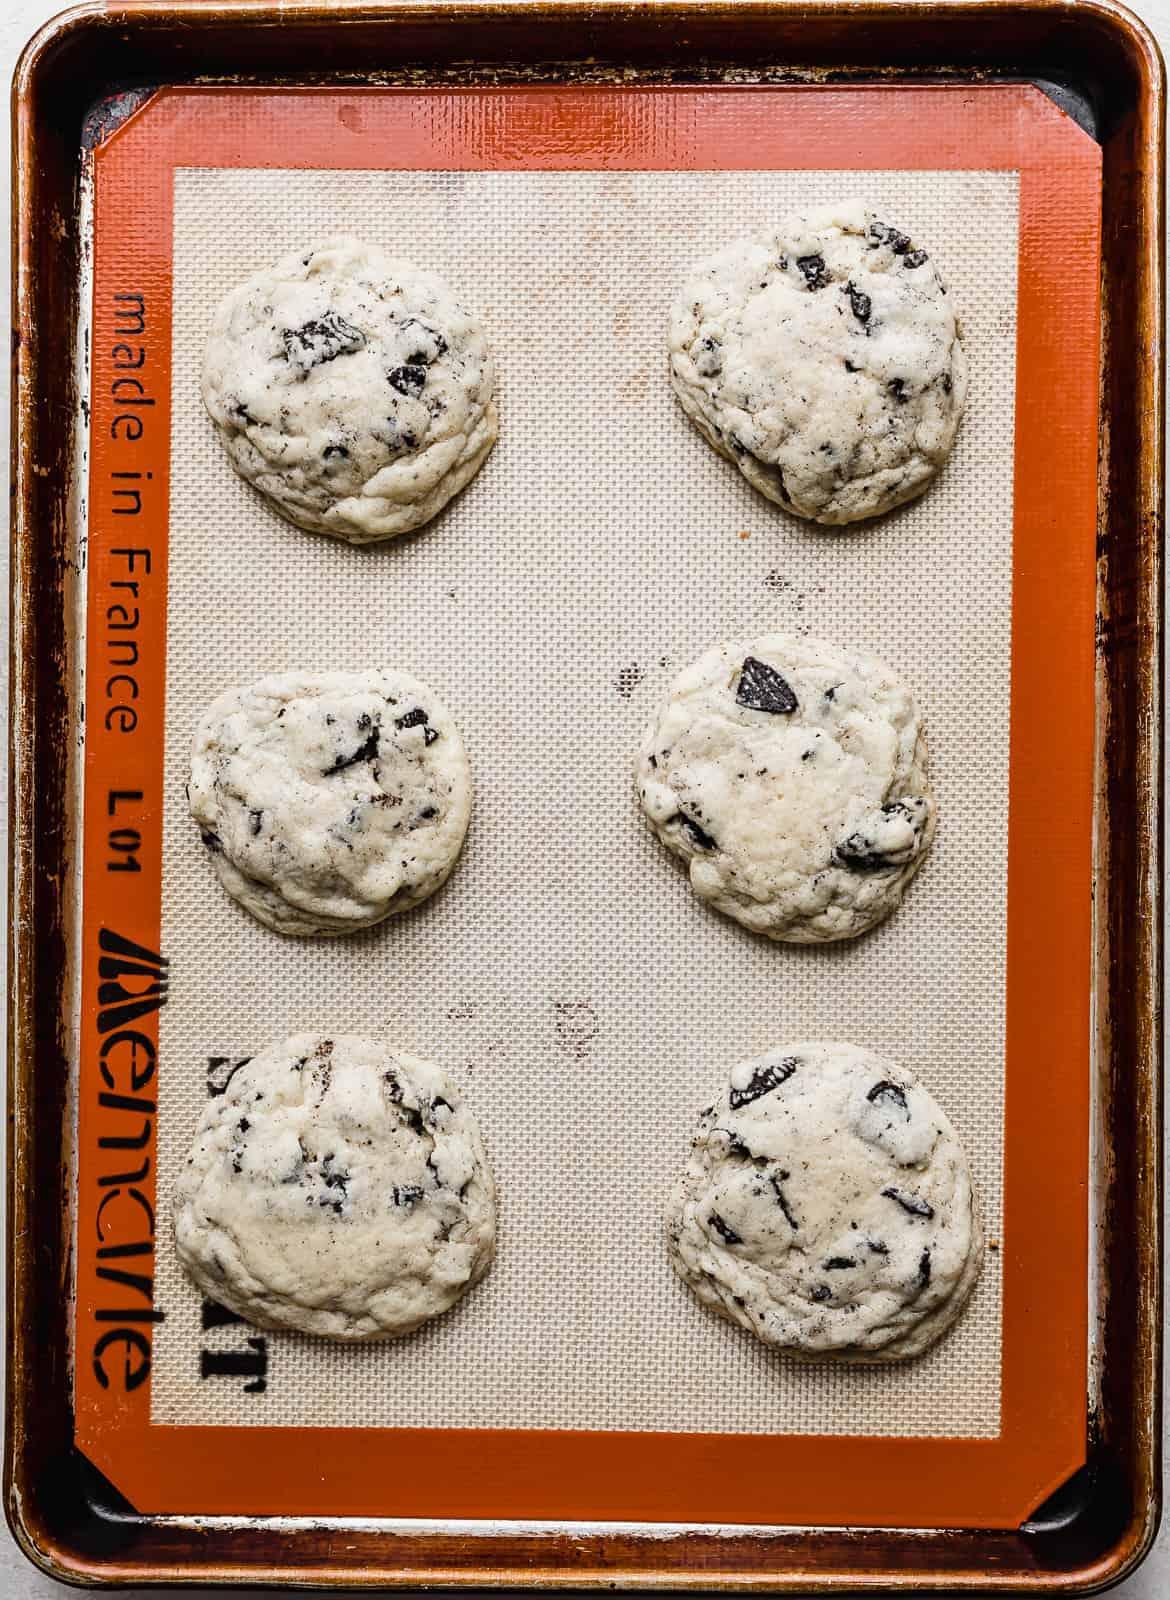 Six baked cookies and cream milkshake cookies on a baking sheet.